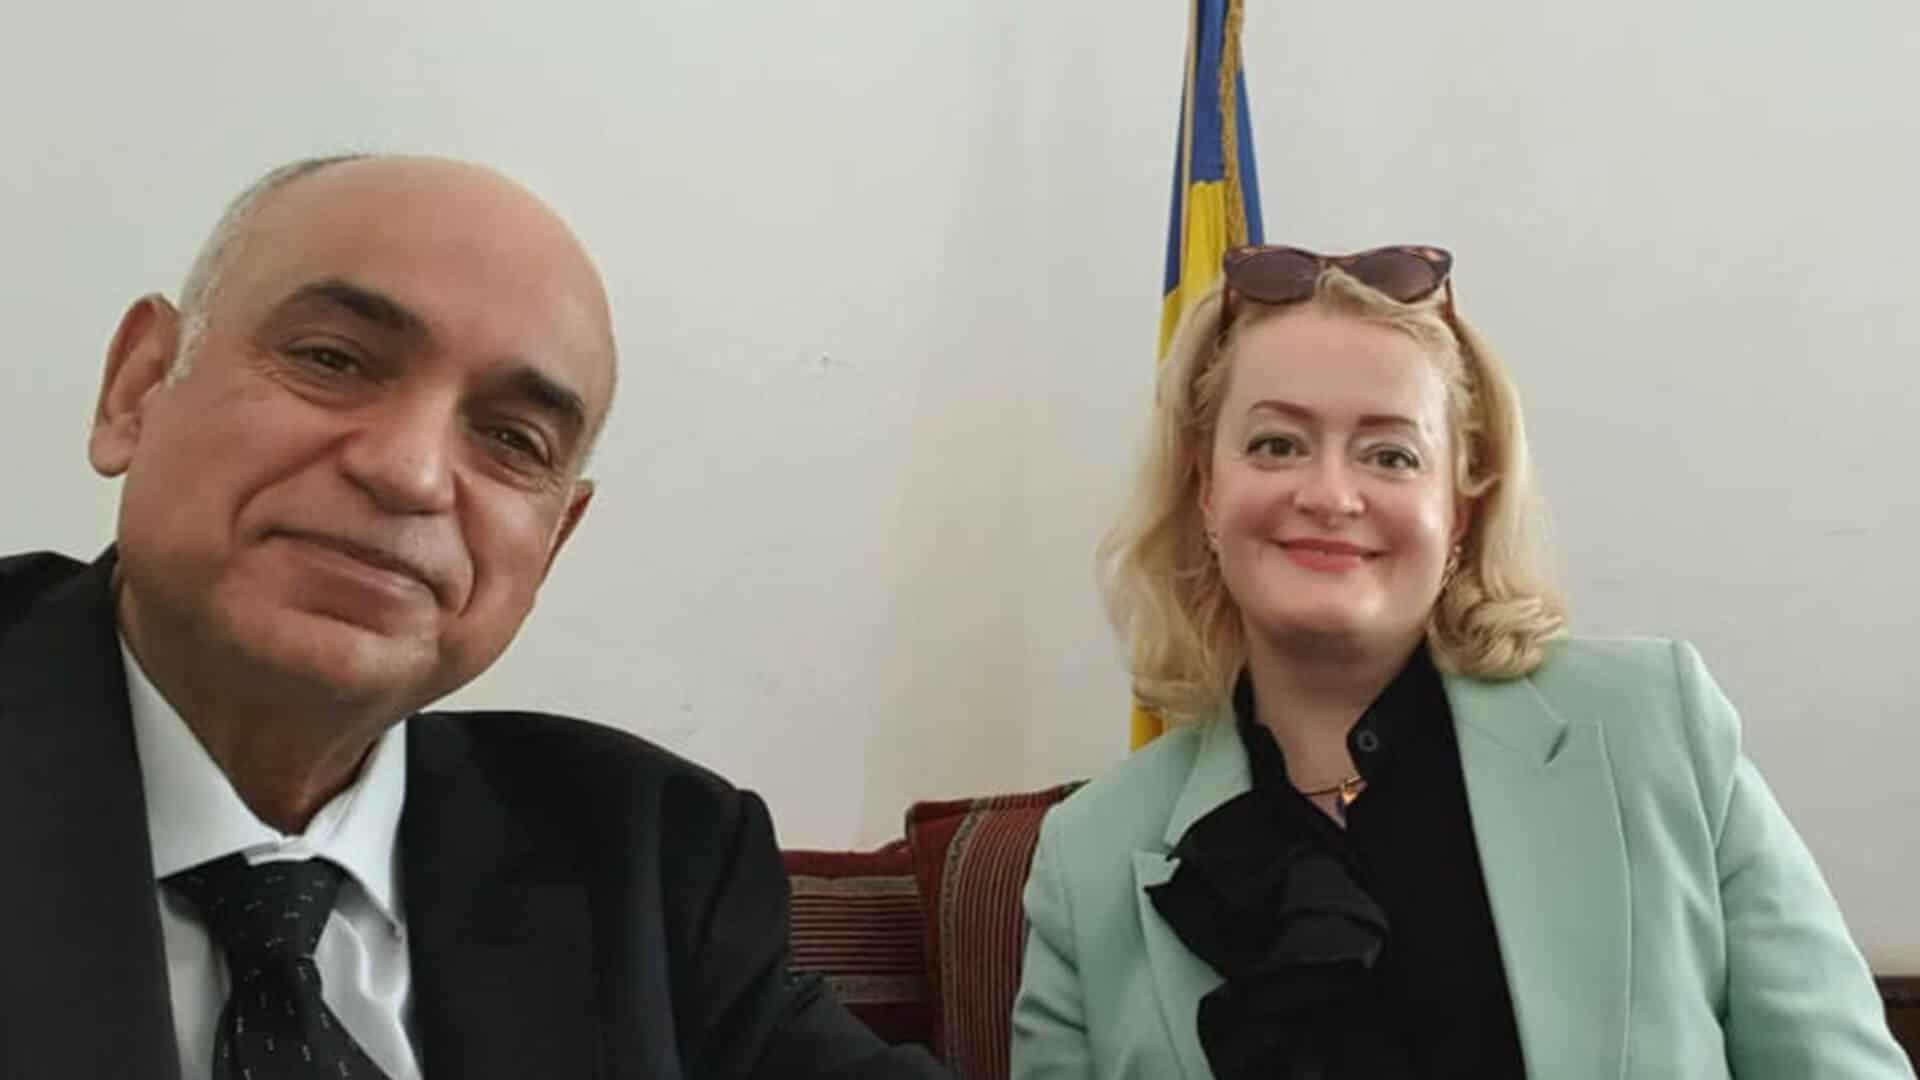 BUC - News - Cooperation Protocol Between the Ukrainian Embassy and BUC - 3